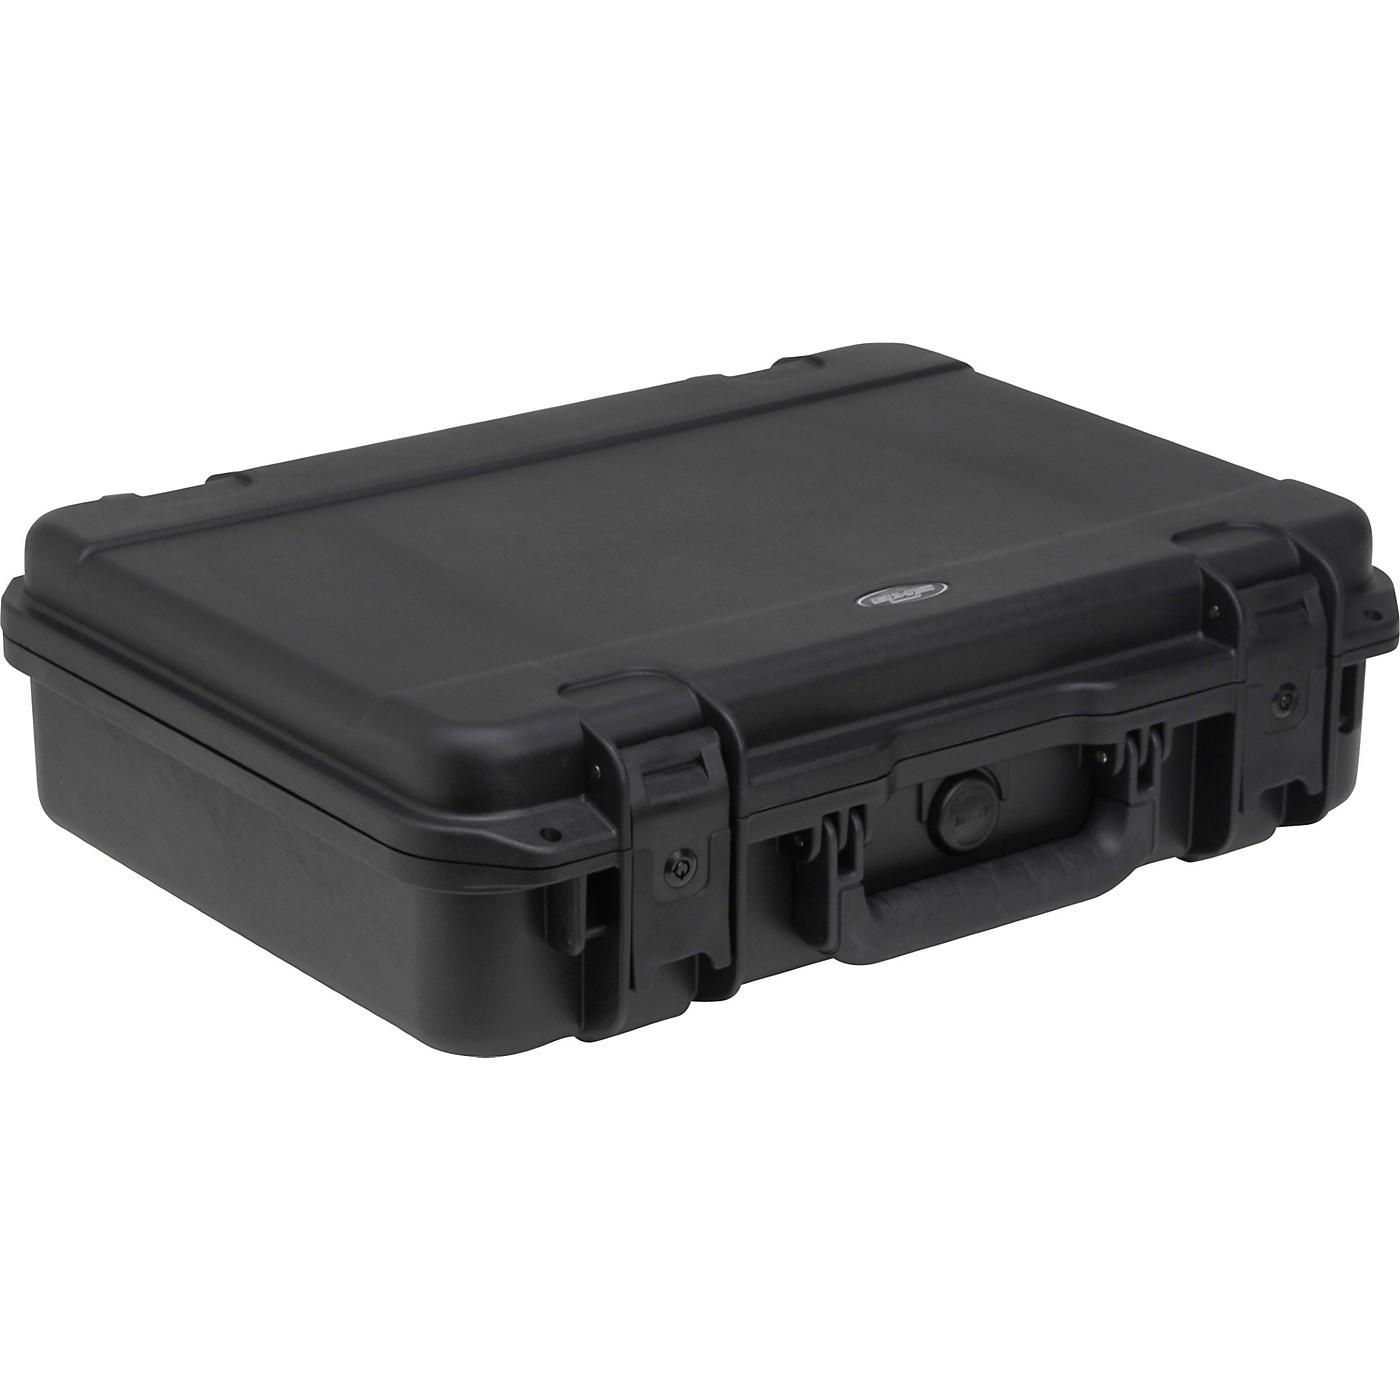 SKB 3i-1813-5B Military Standard Waterproof Case thumbnail